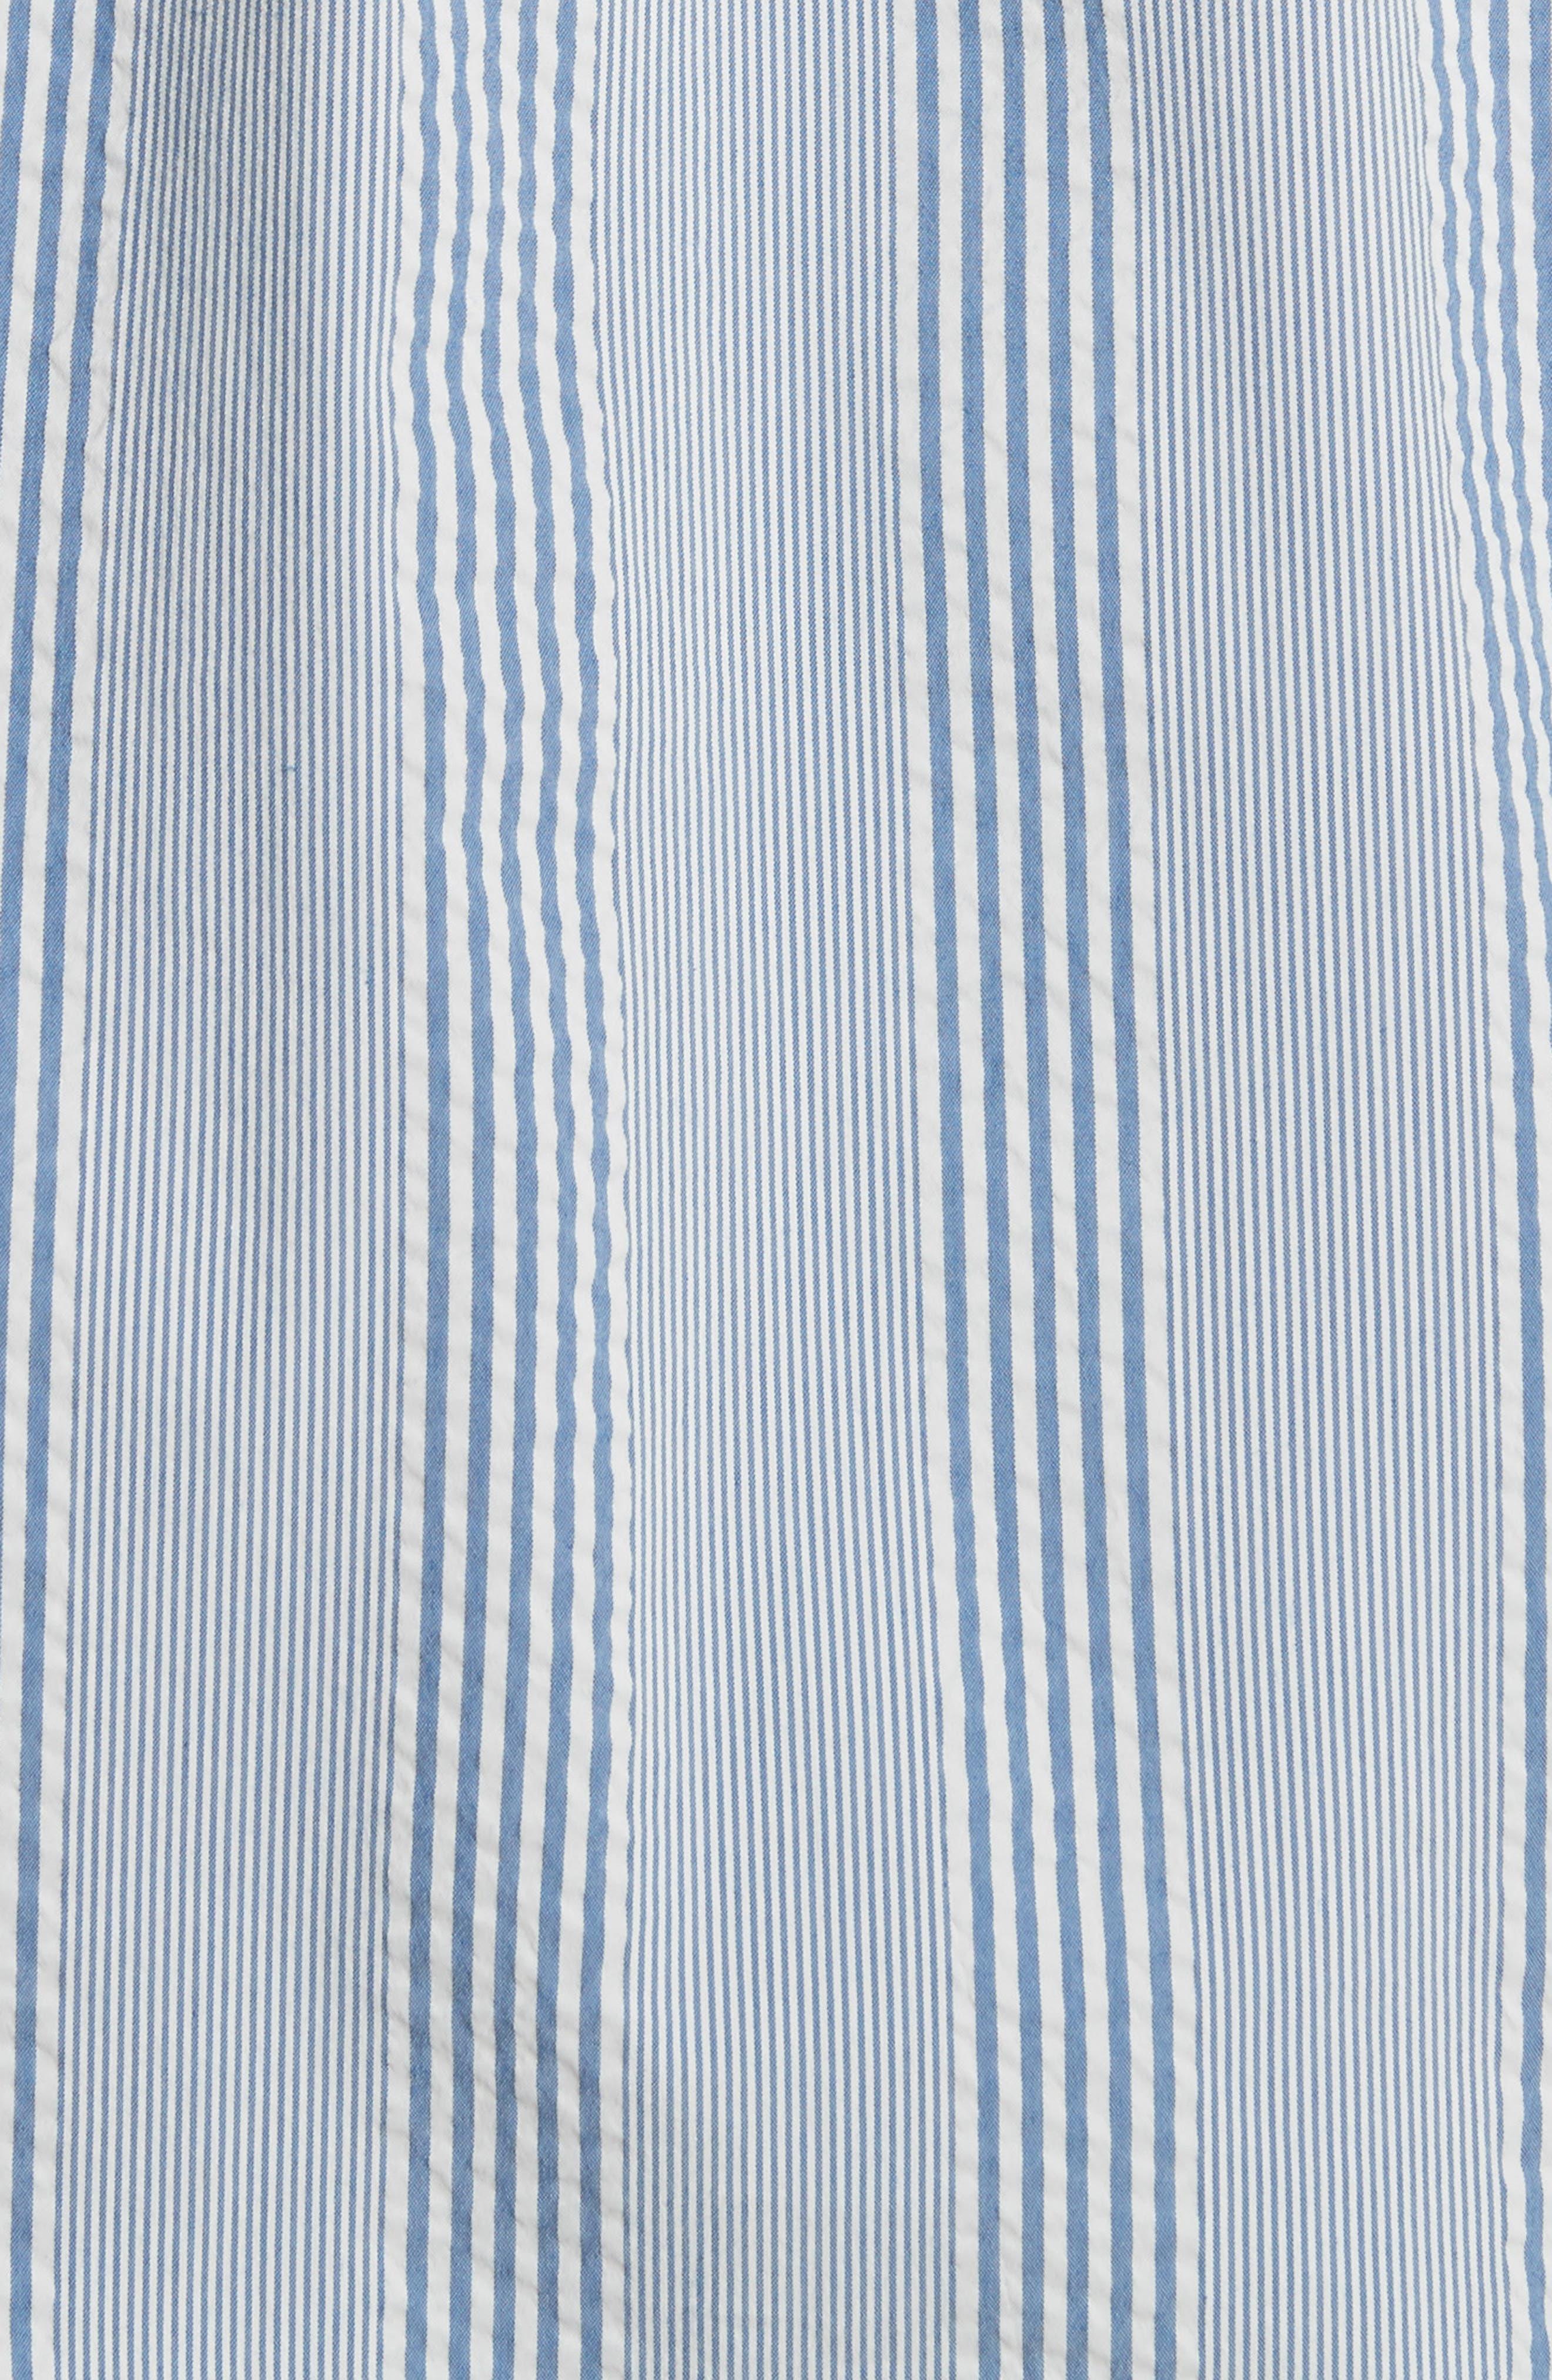 Osvald Seersucker Shirt,                             Alternate thumbnail 5, color,                             460